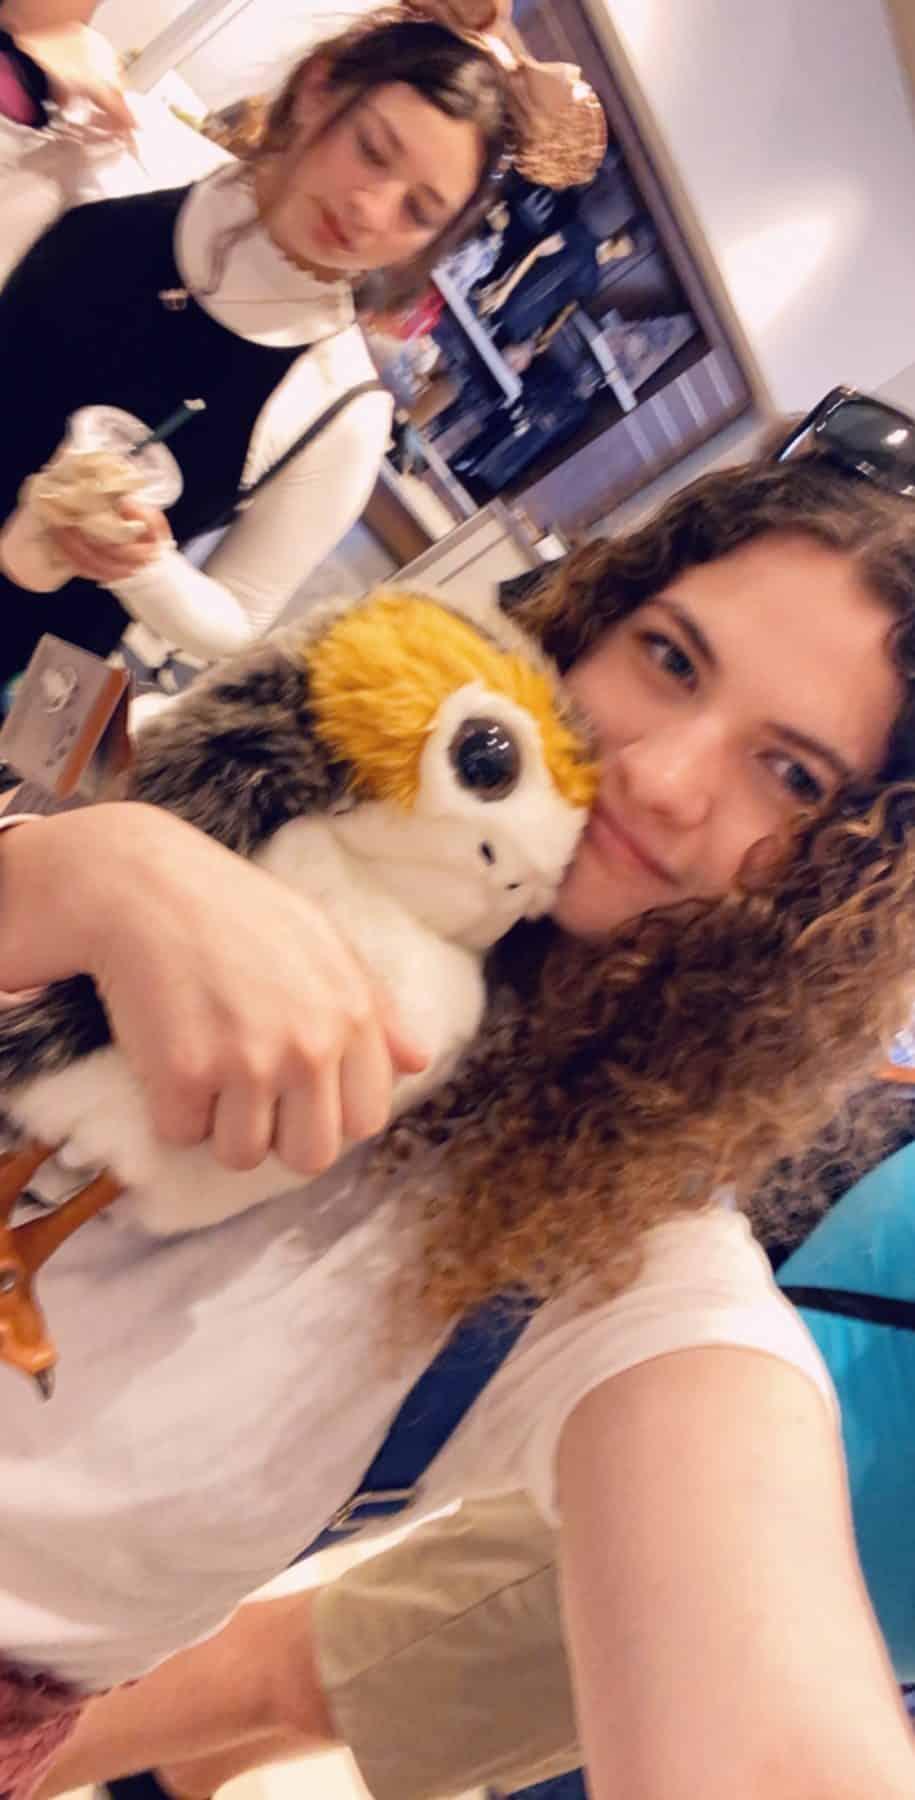 teenage girl hugging a porg stuffed animal